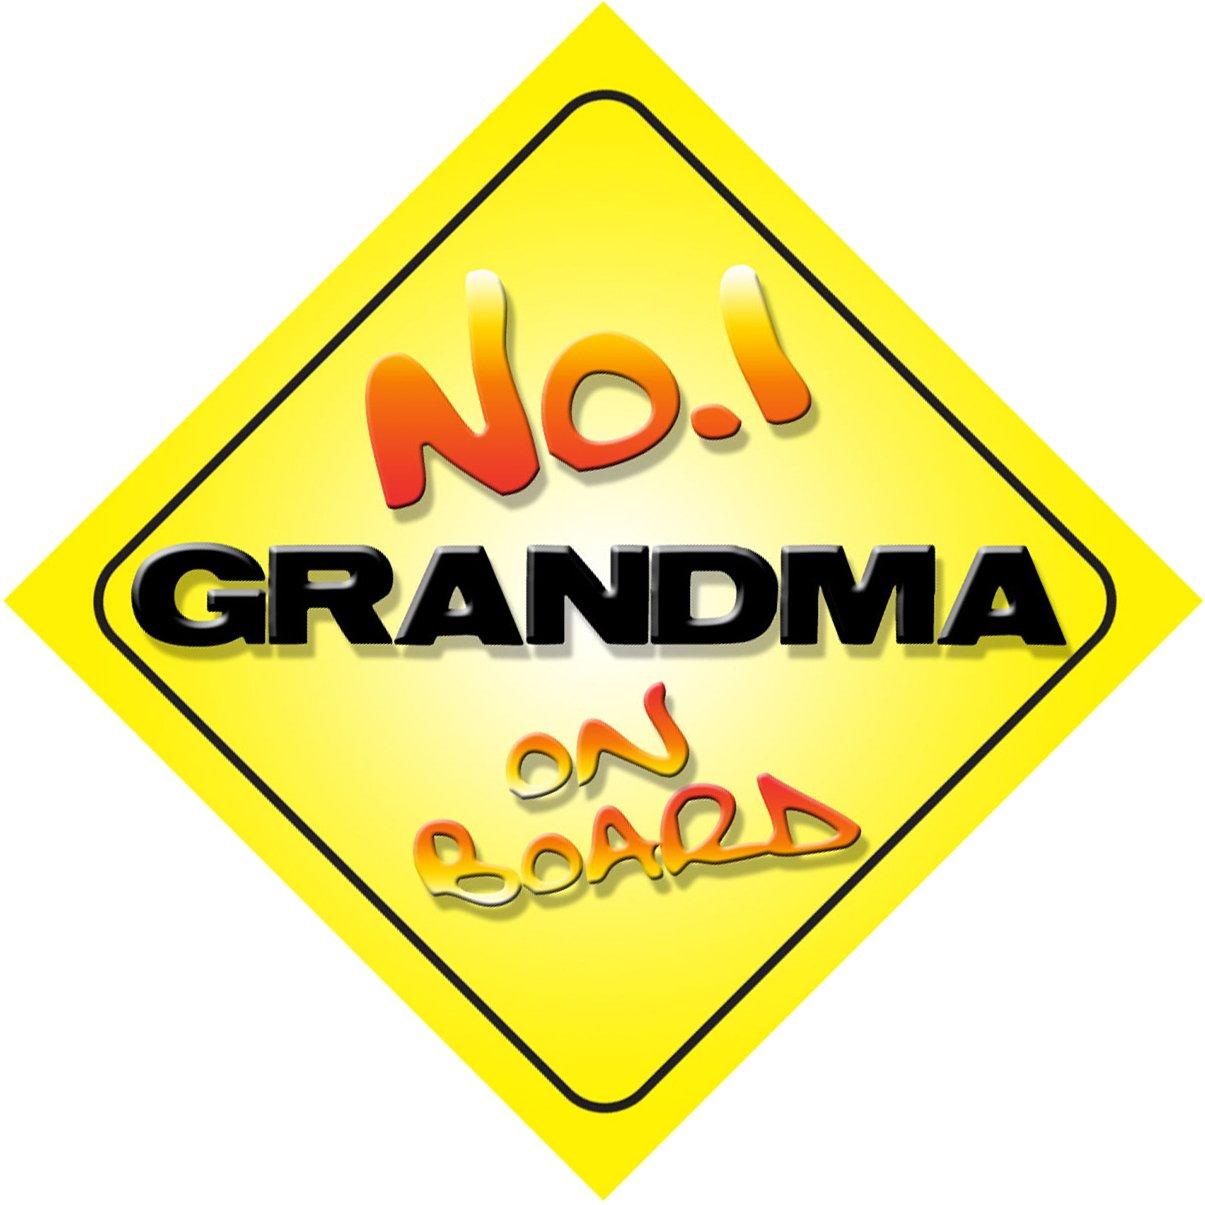 No.1 Grandma on Board Novelty Car Sign Novelty Gift / Present Quality Goods Ltd